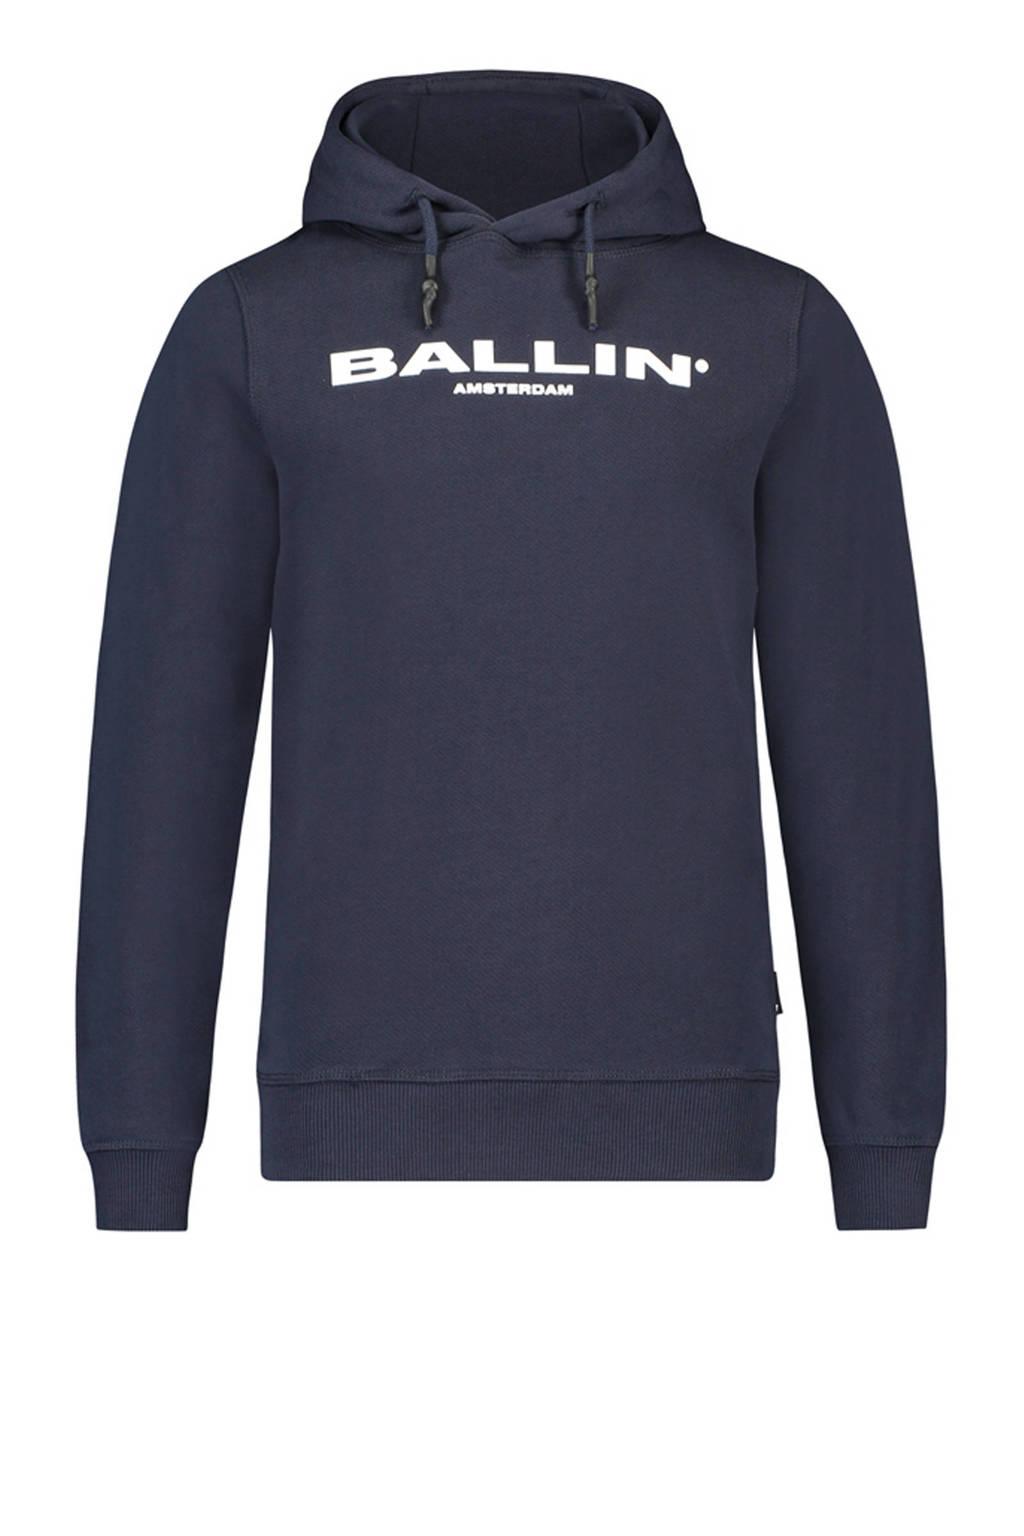 Ballin hoodie met logo donkerblauw, Donkerblauw